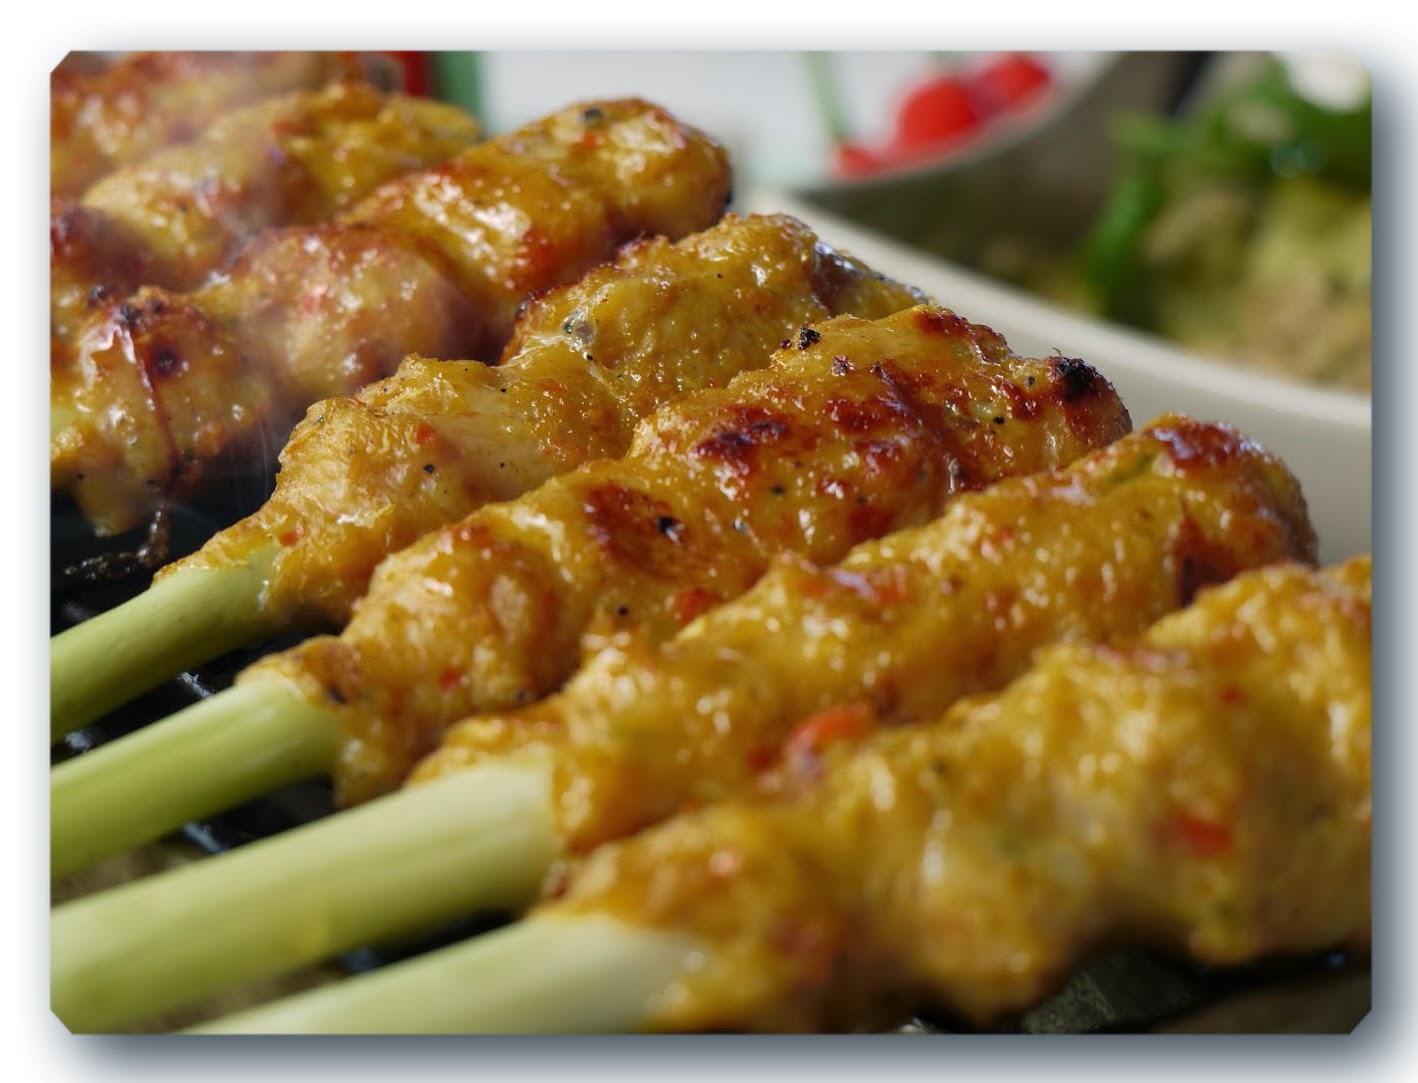 resep sate lilit khas bali resep masakan dunia